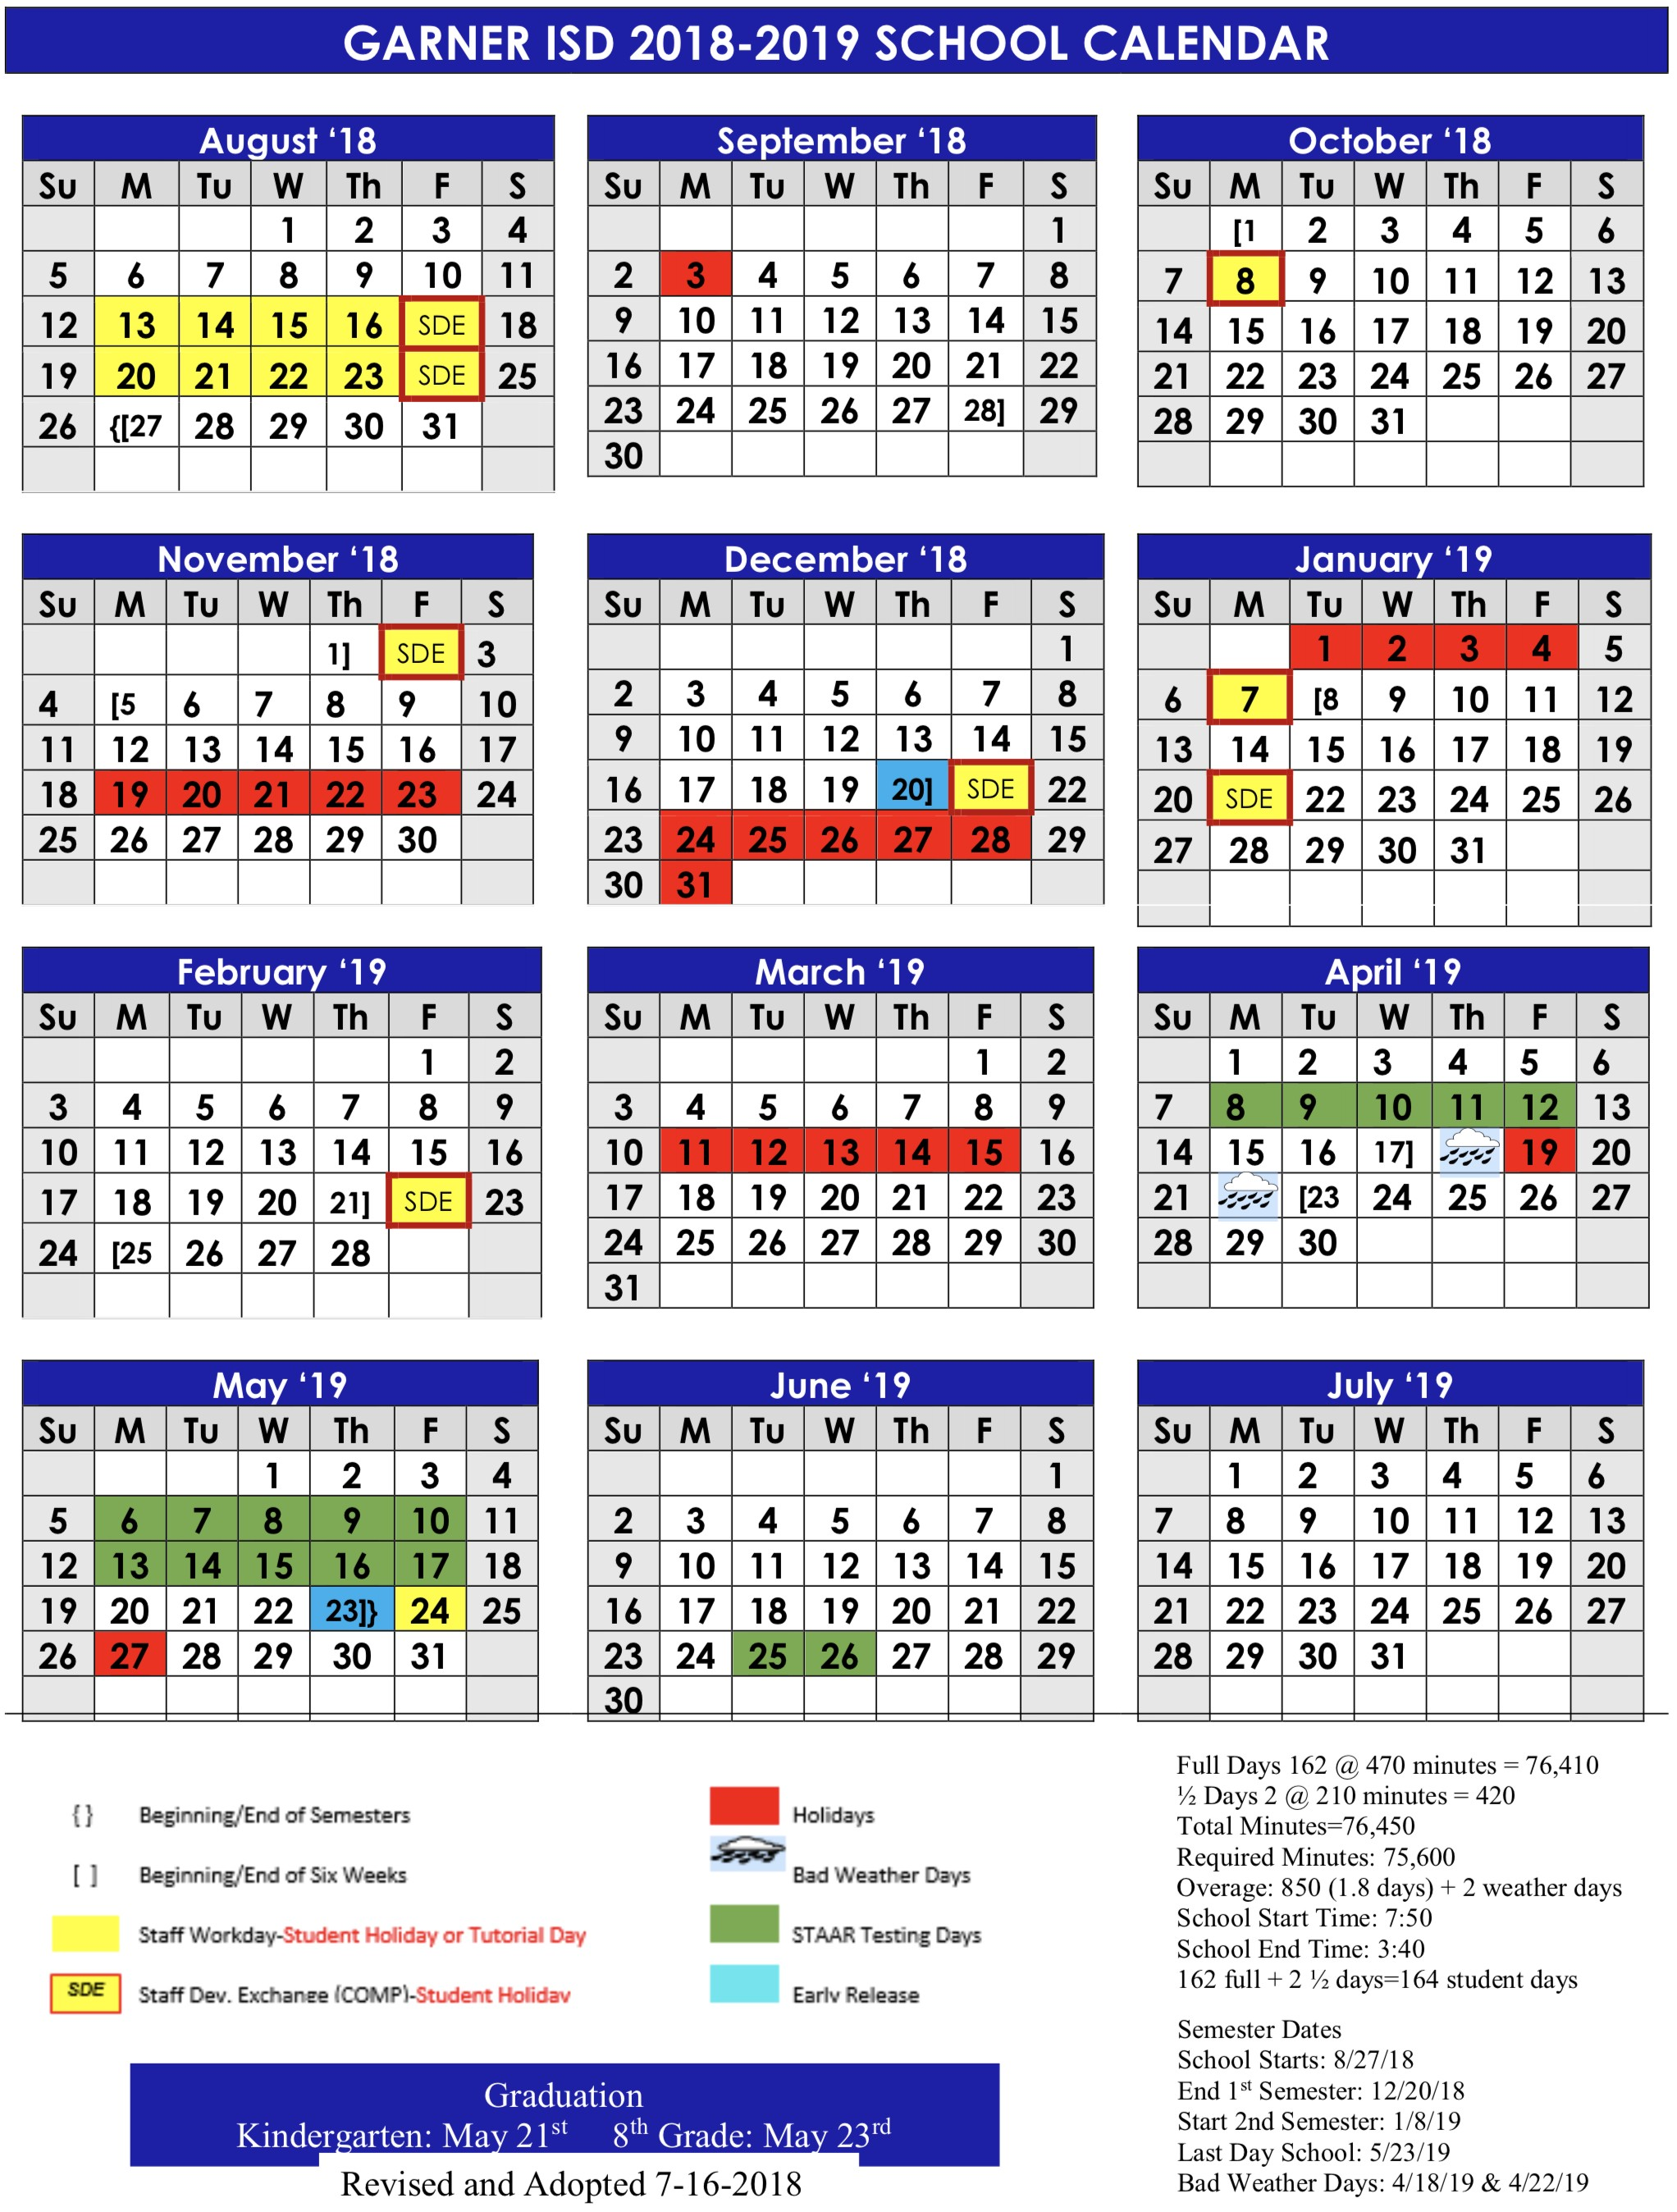 Printable 2020-2016 Calendar Printable School Calendar 2020 2020 Calendar Garner isd | Get Free